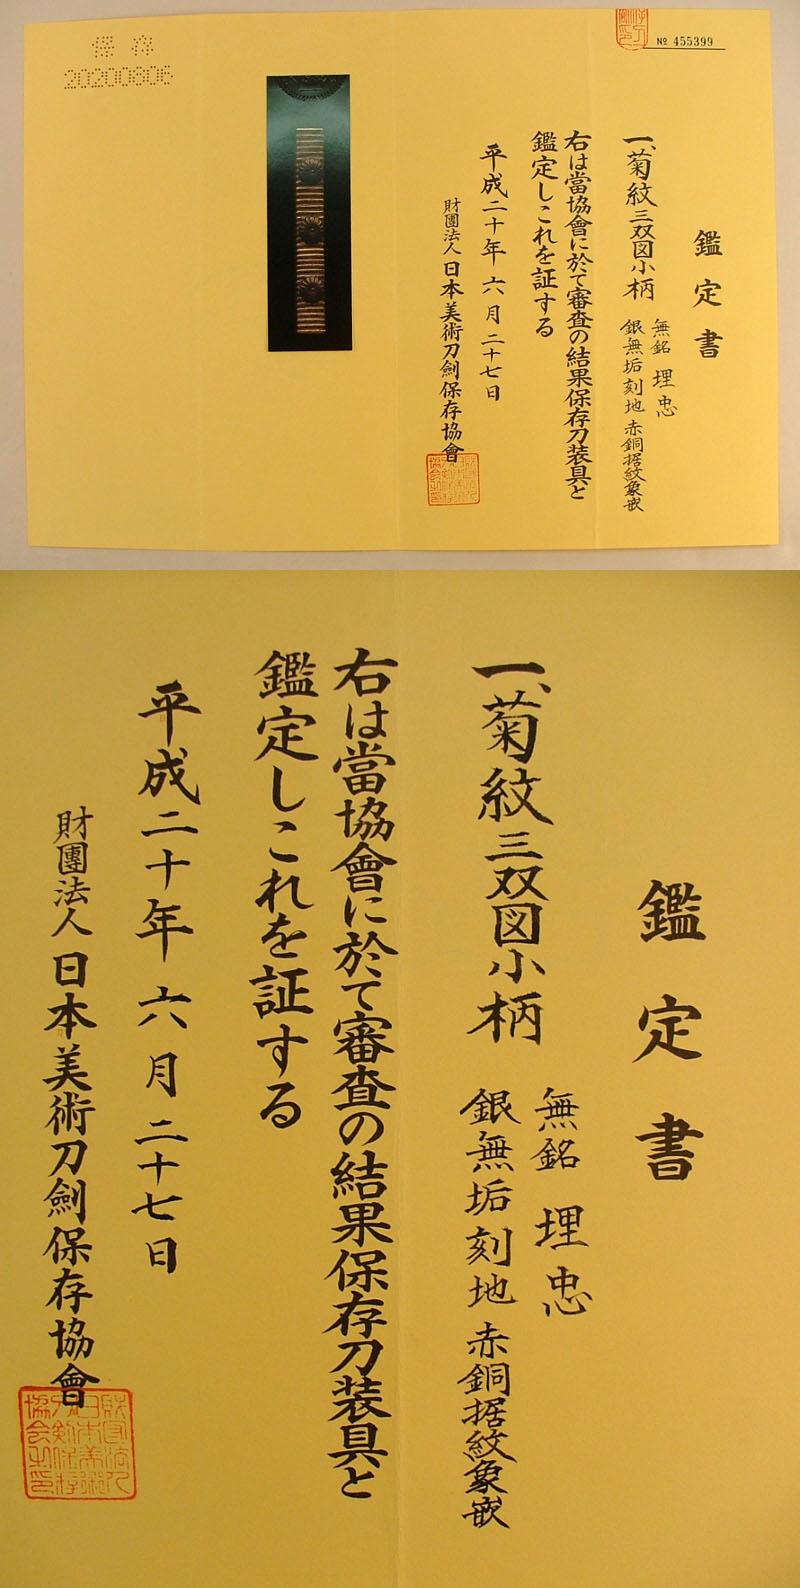 菊紋3双図小柄 無銘 埋忠 Picture of Certificate